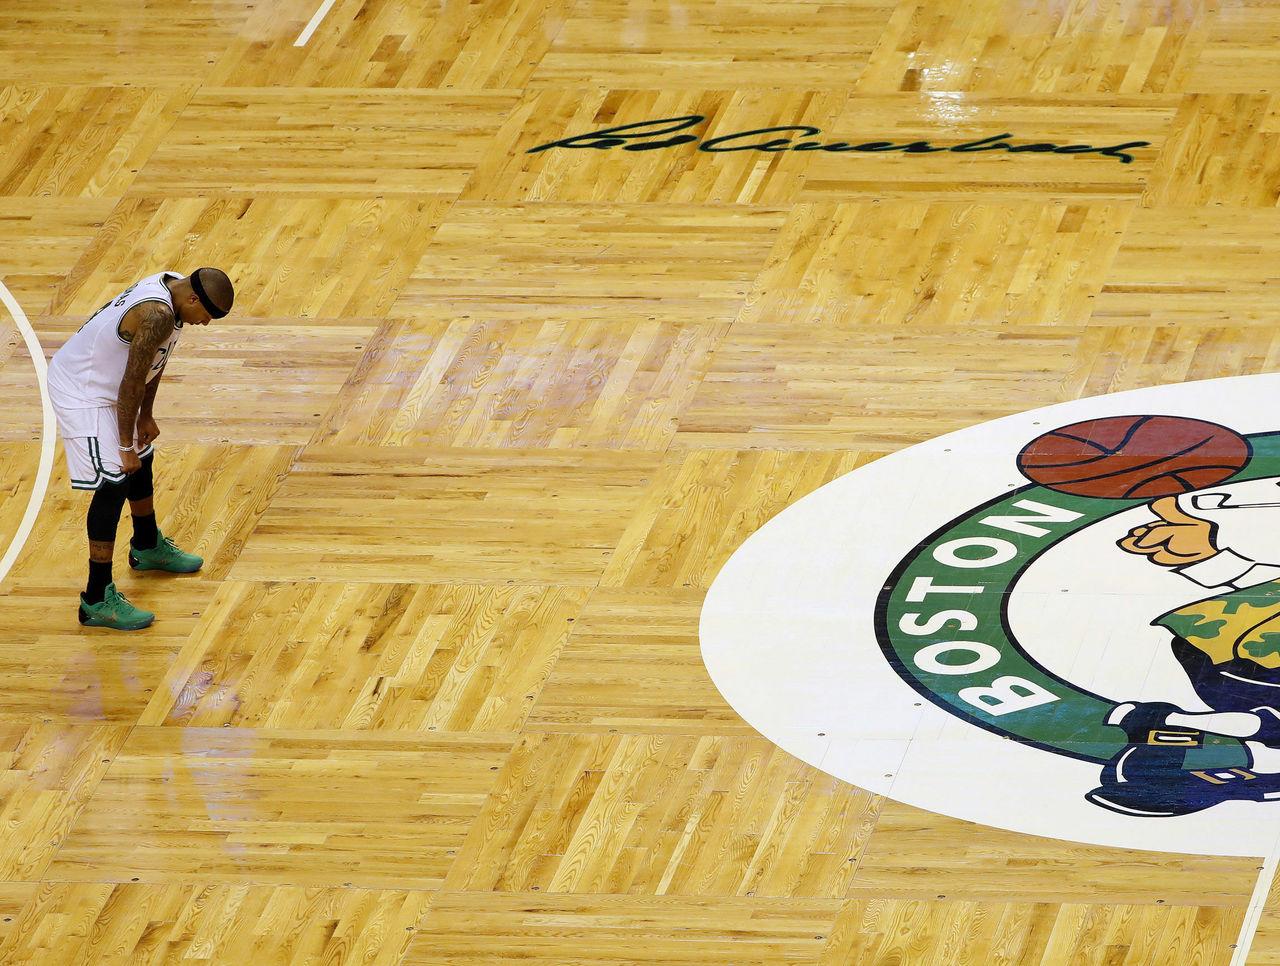 Cropped 2017 04 17t013349z 150842748 nocid rtrmadp 3 nba playoffs chicago bulls at boston celtics